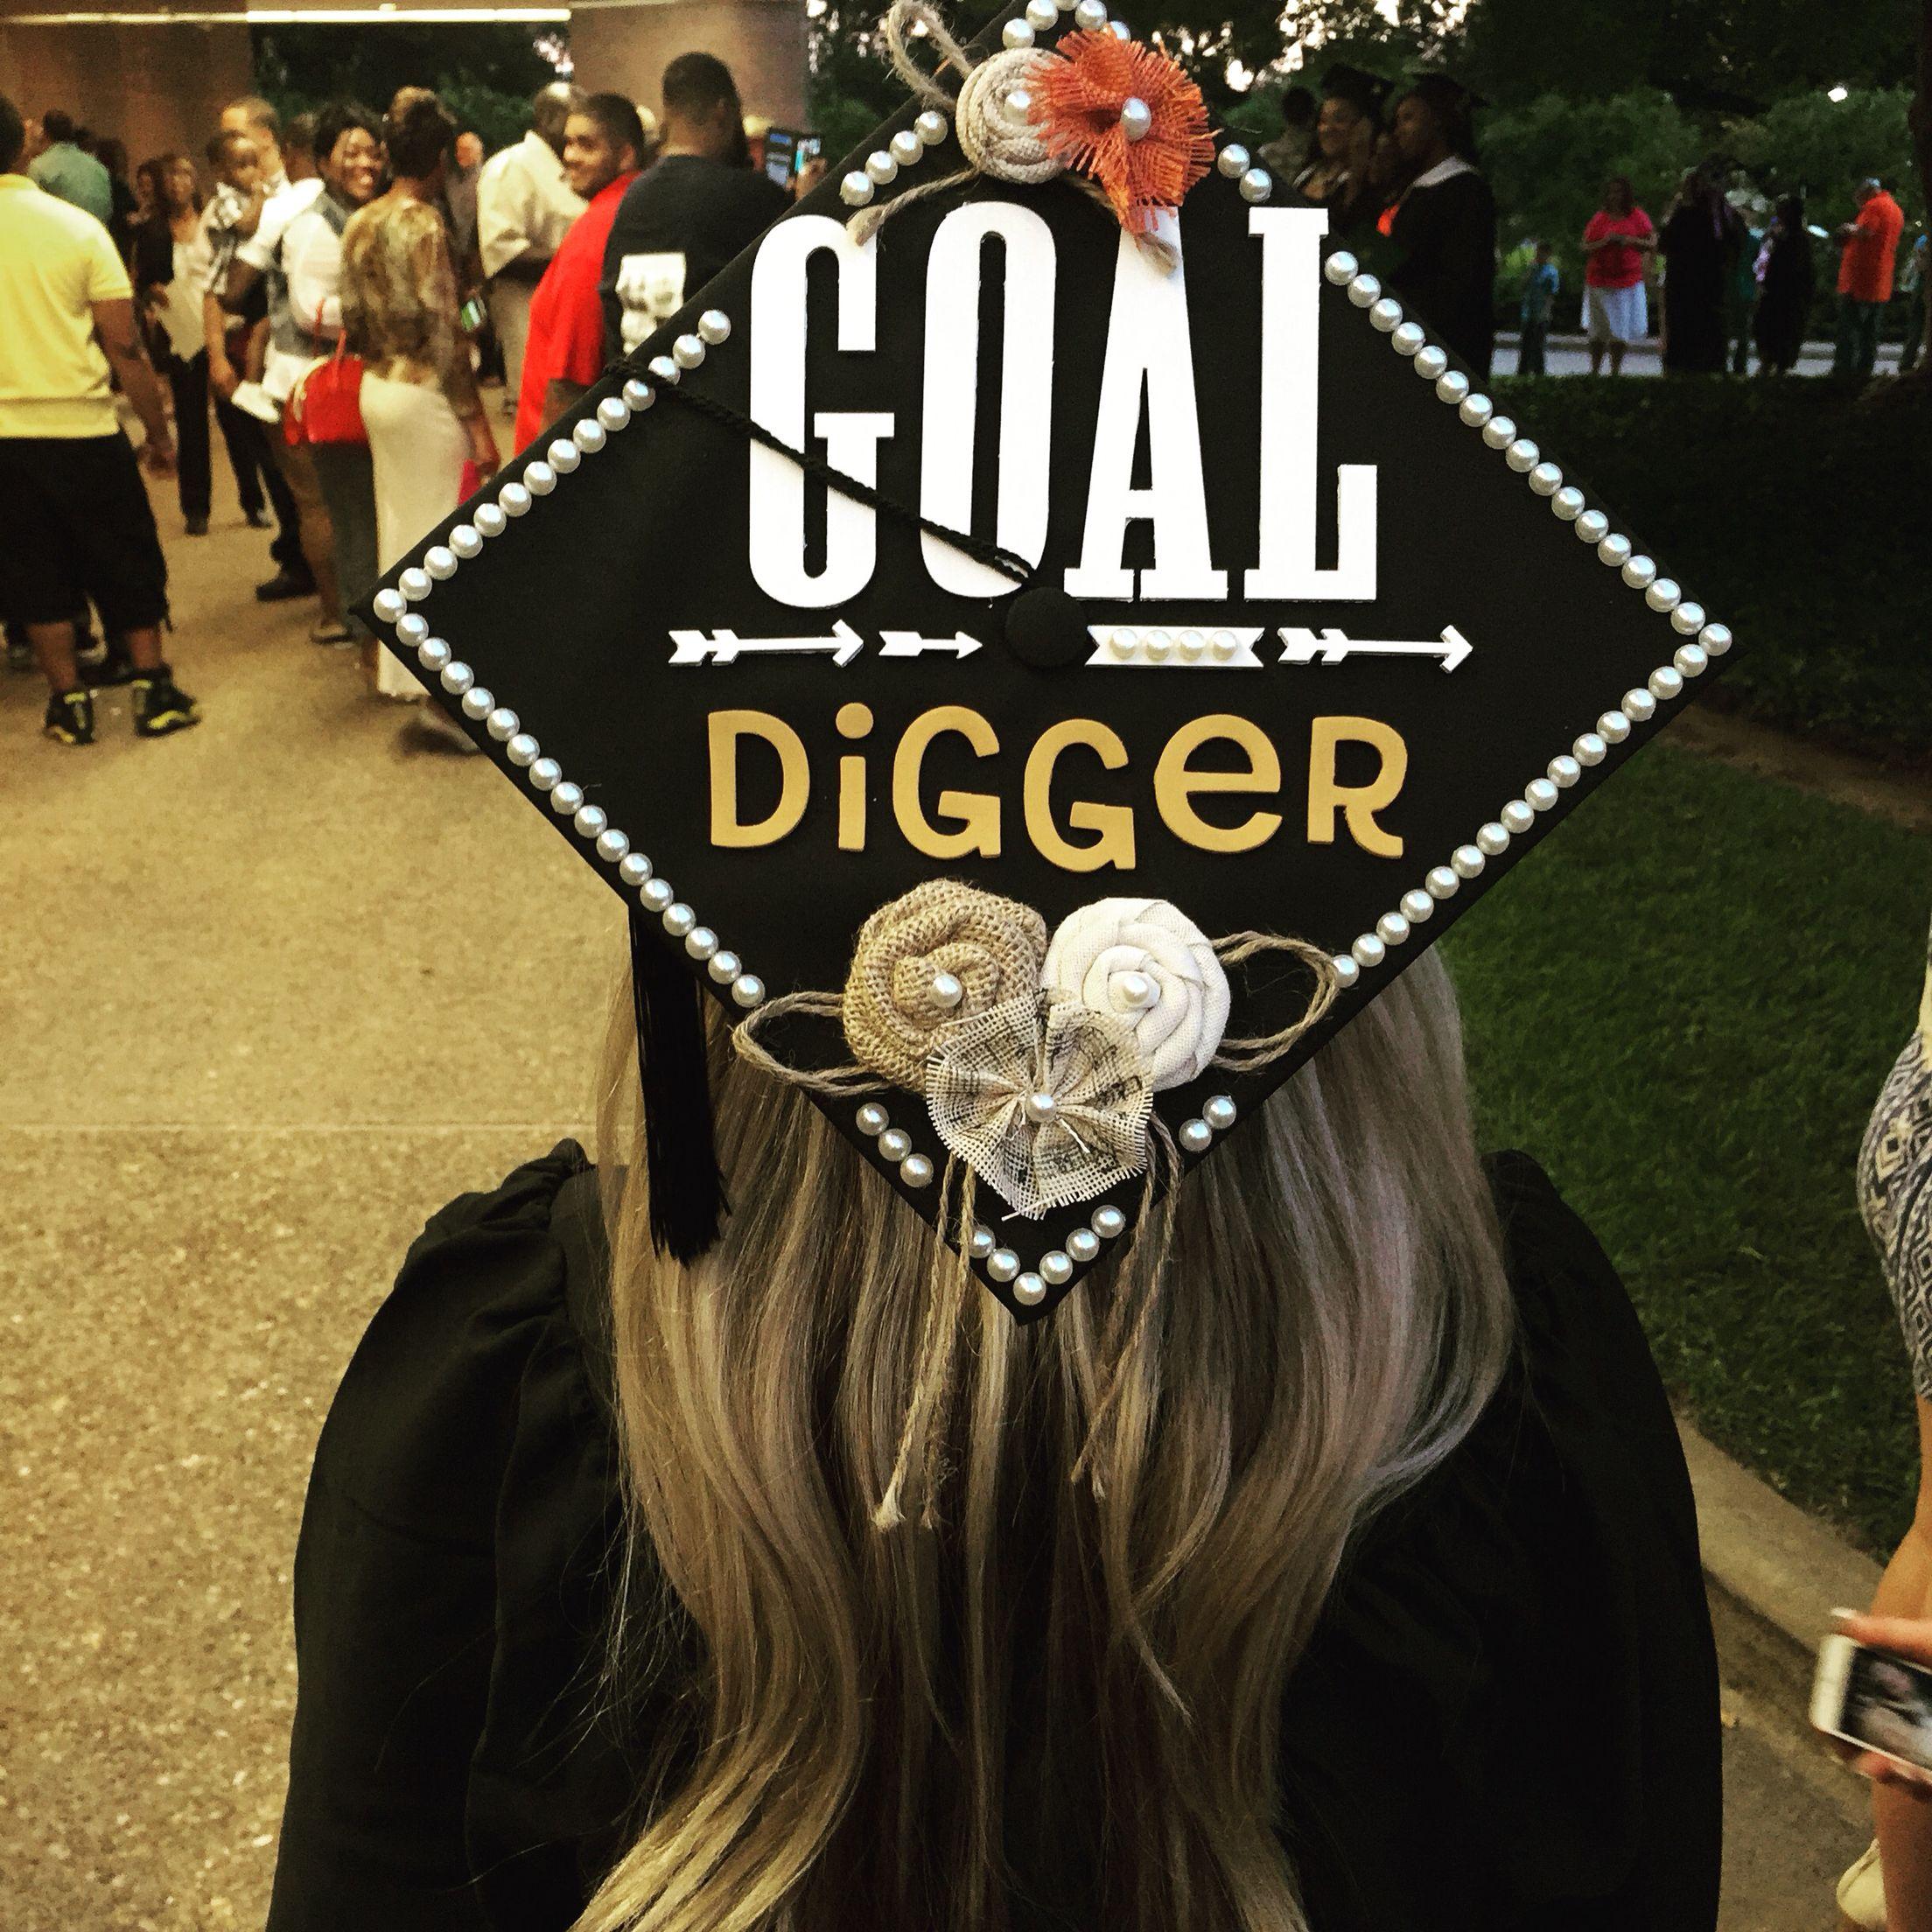 interior design ndsu - 1000+ images about Graduation on Pinterest Graduation caps, Grad ...